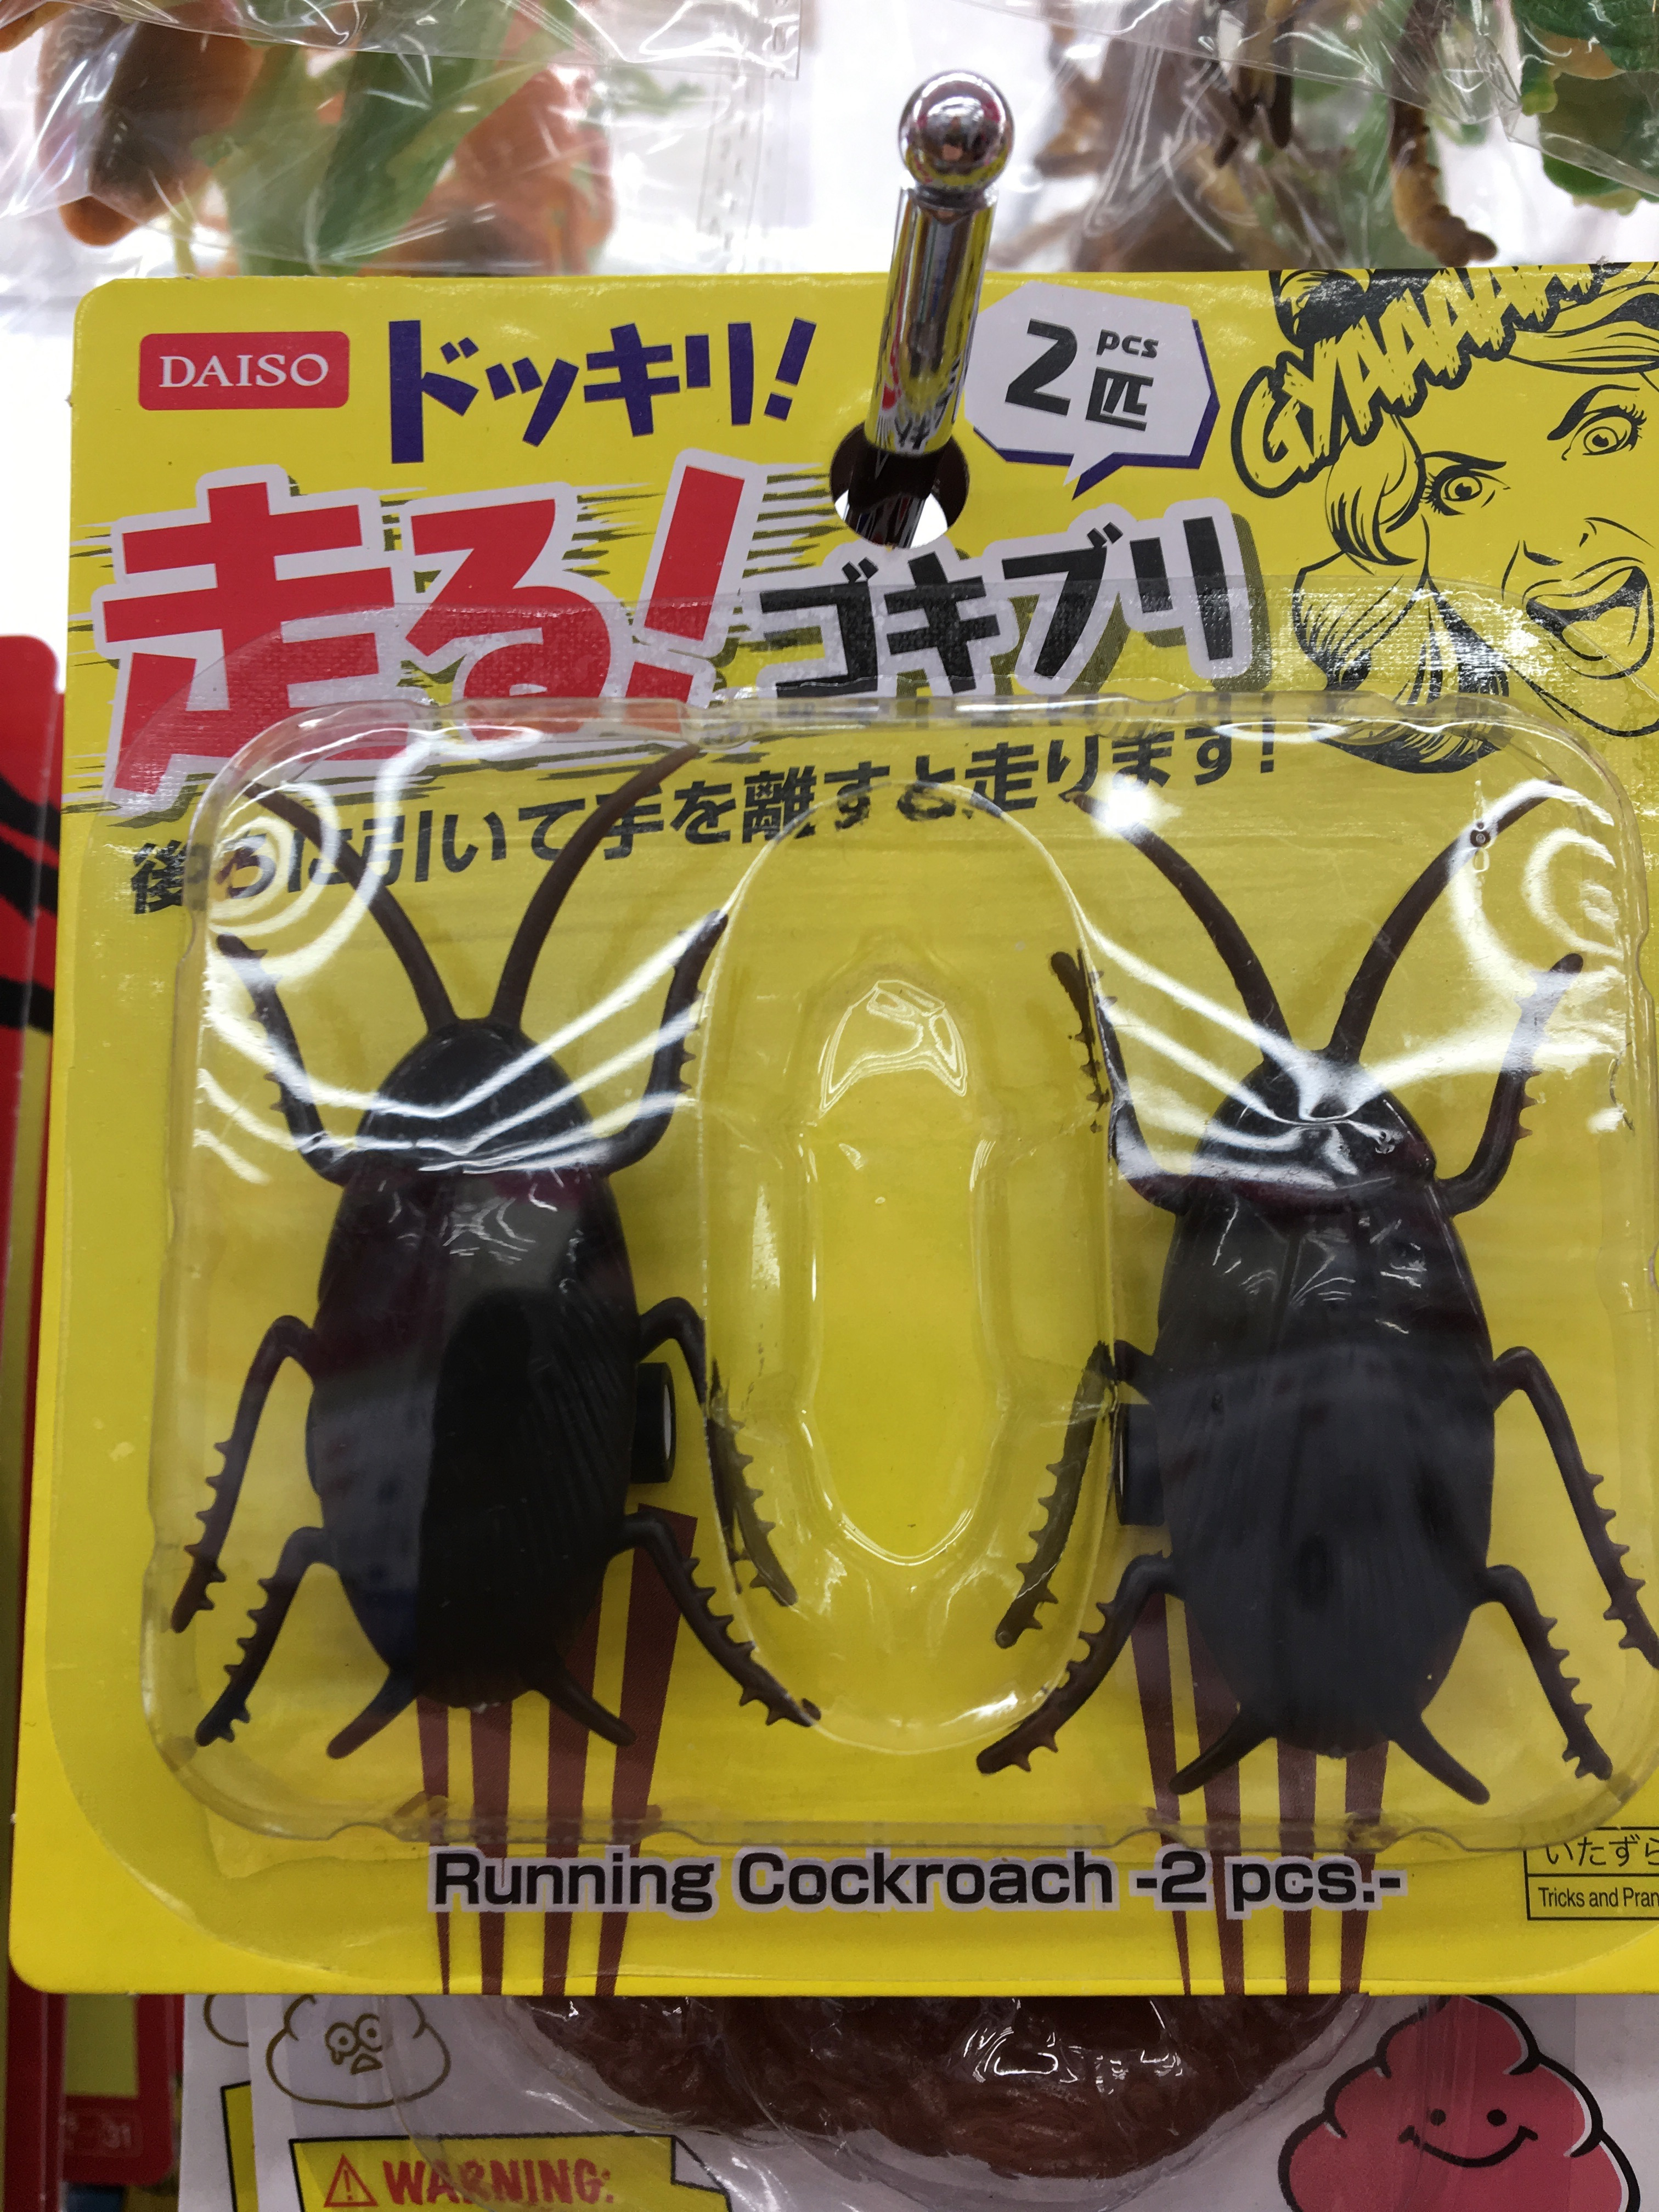 Running Cockroach Daiso